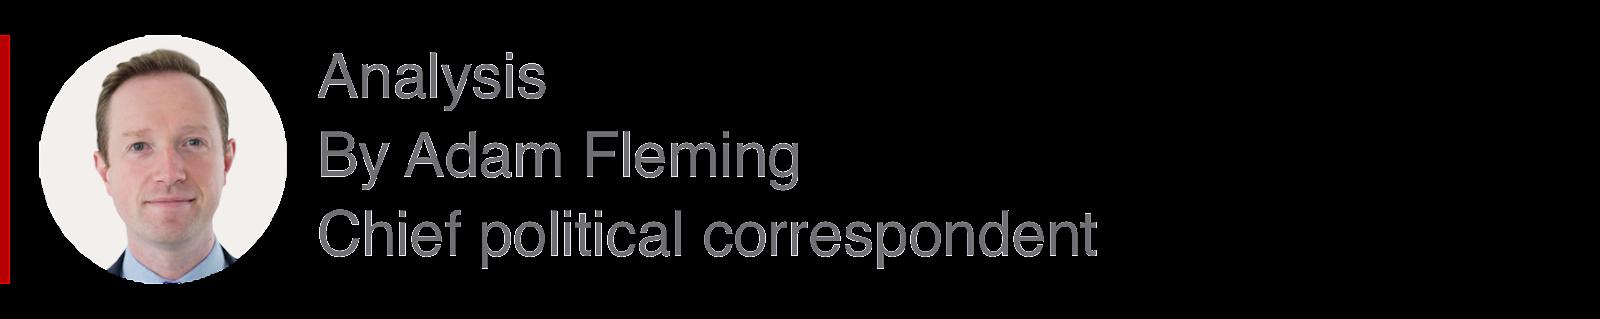 Analysis box by Adam Fleming, Chief political correspondent